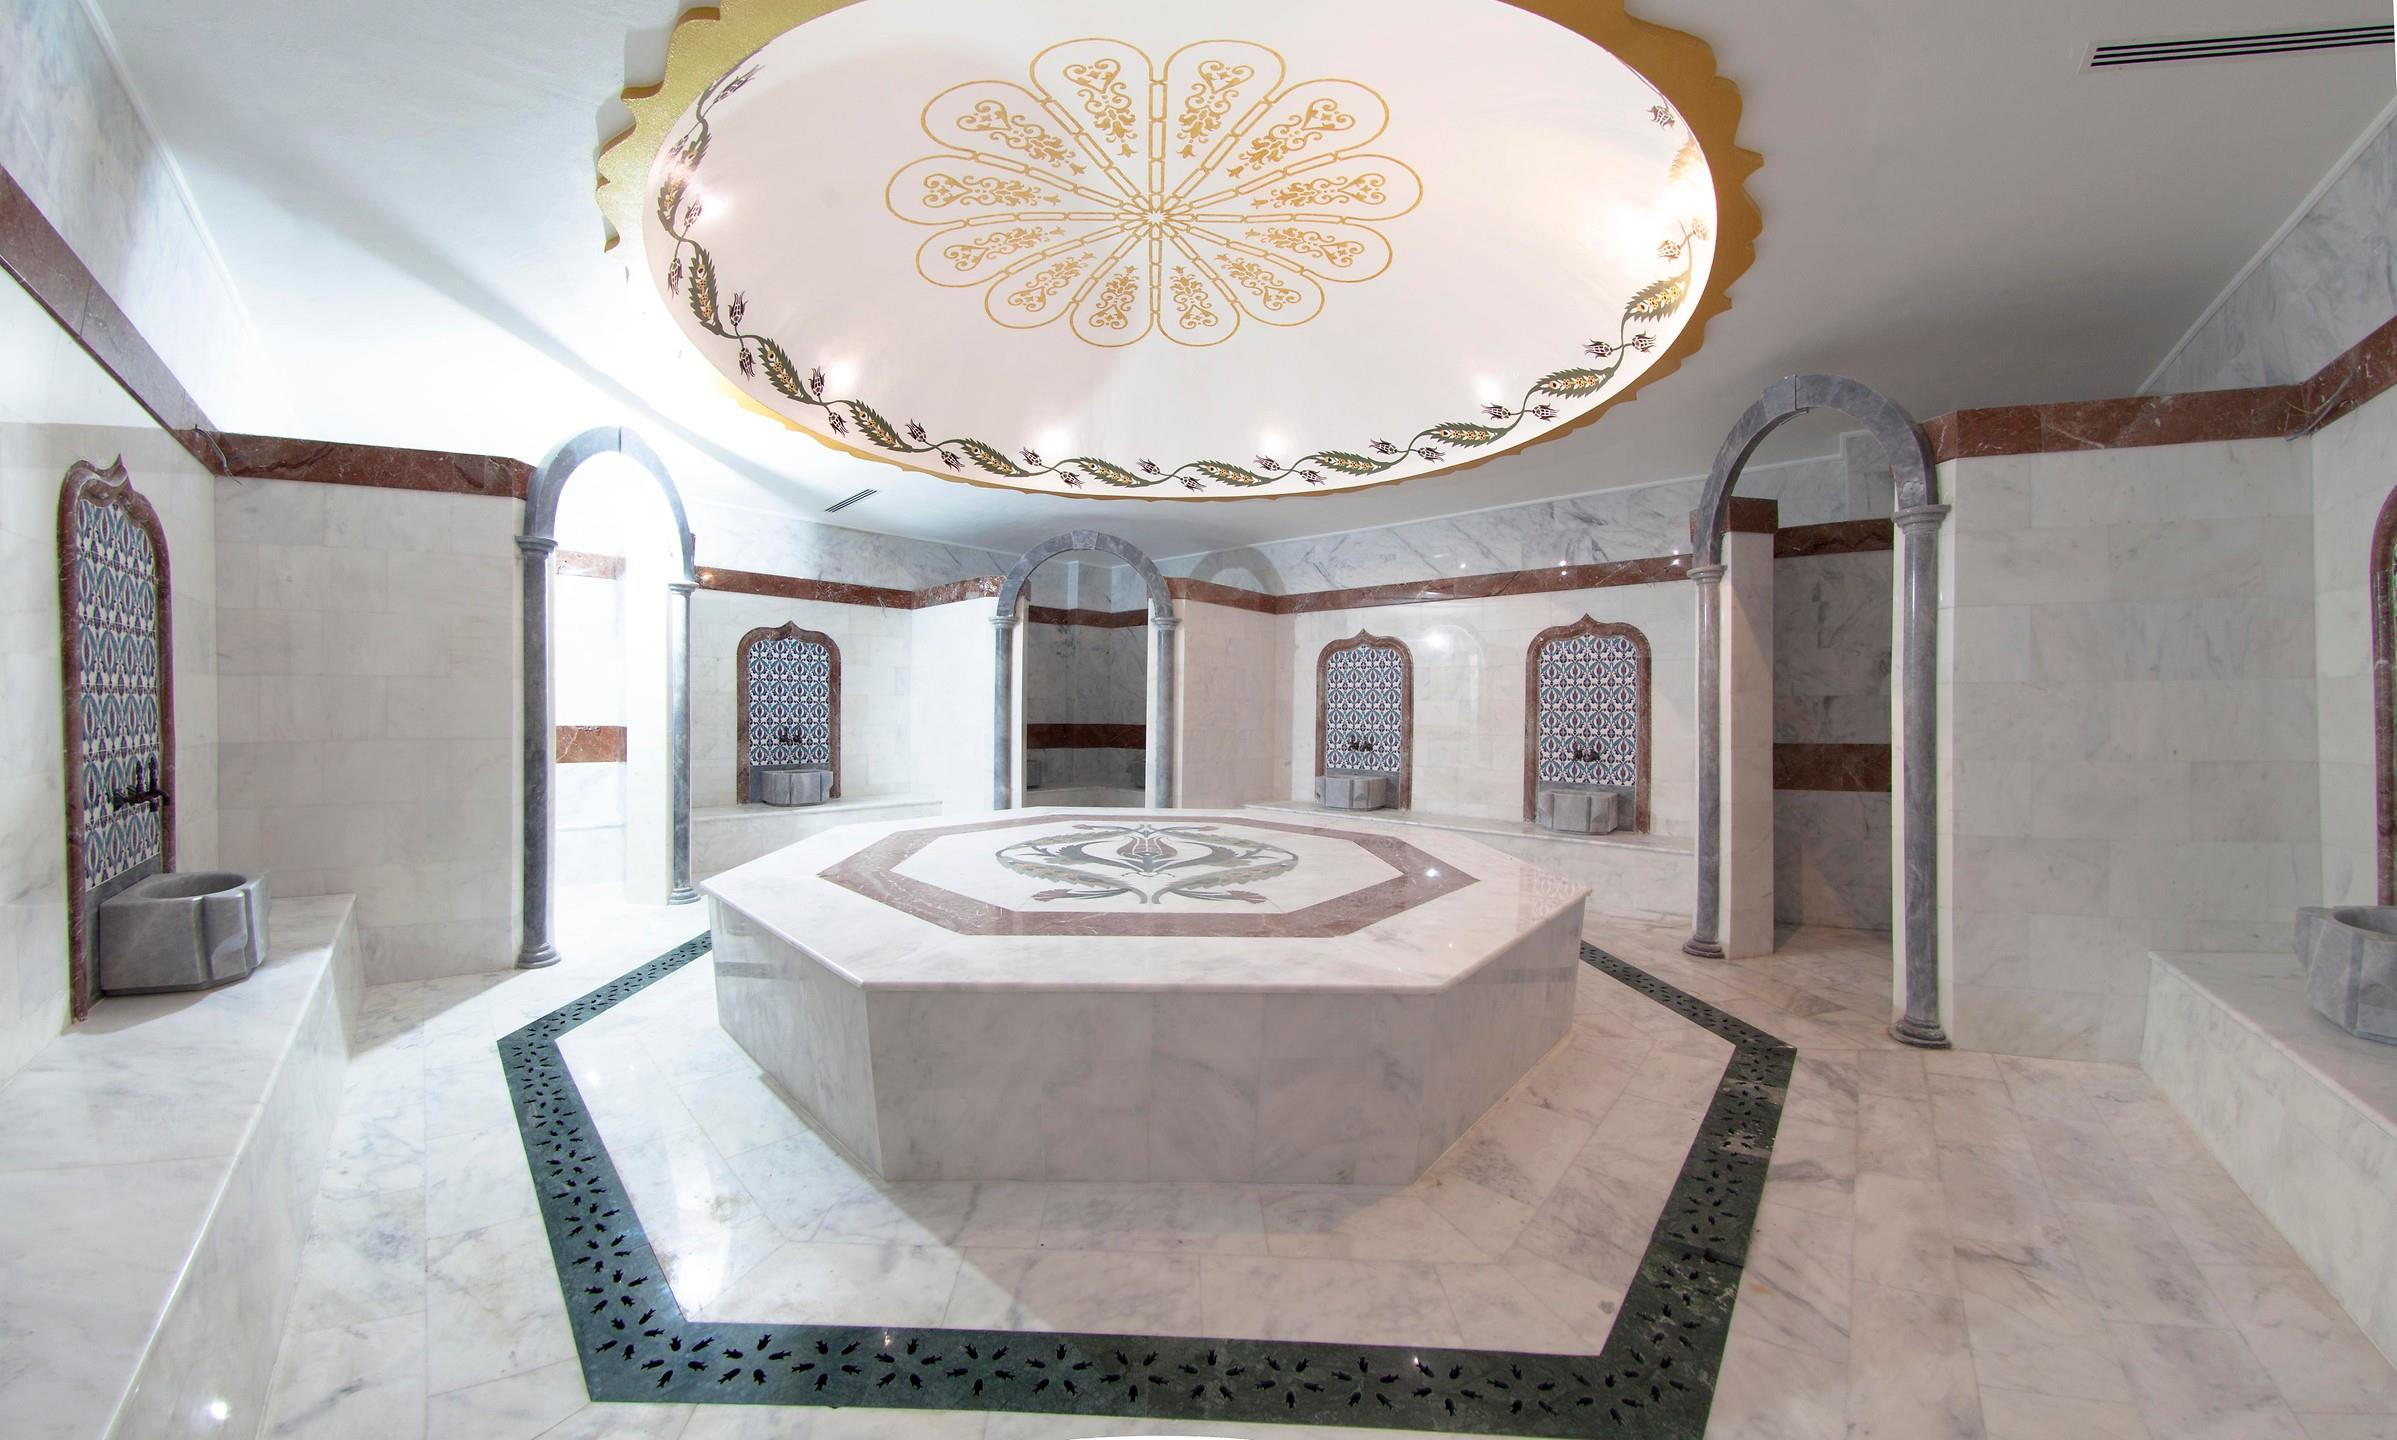 Budan Thermal Spa Hotel & Convention Cen203952